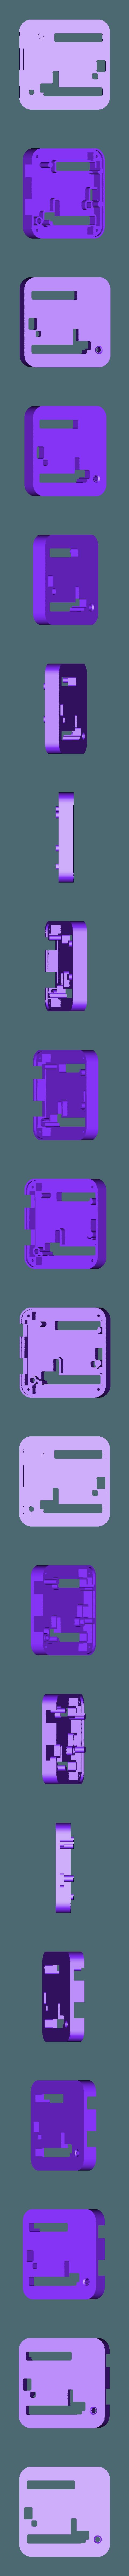 uno_case_lid.stl Download free STL file 3D Printed Case for Arduino Uno, Leonardo. • 3D printing model, Lassaalk